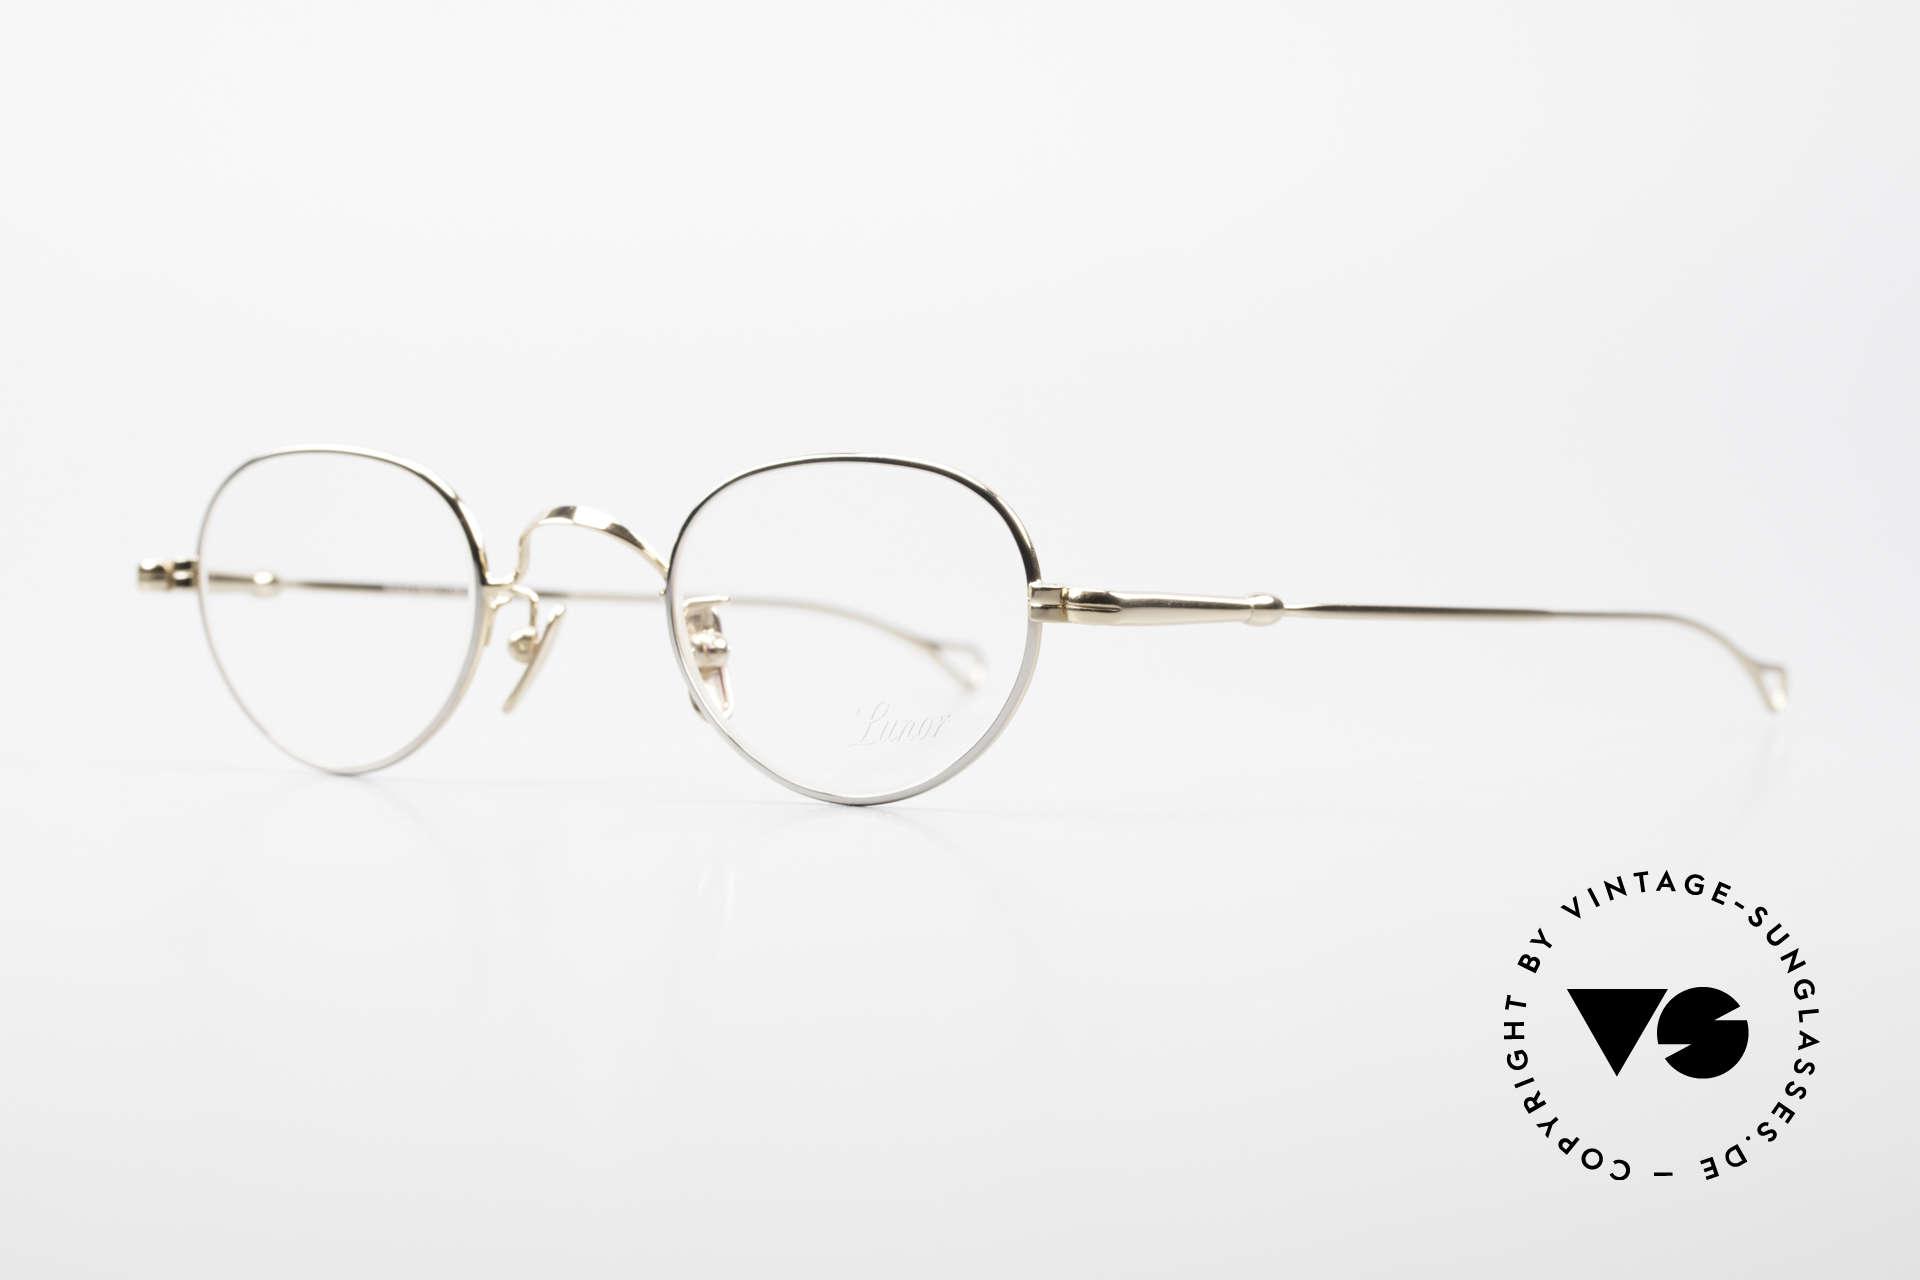 Lunor V 103 Timeless Lunor Frame Bicolor, model V103: very elegant metal glasses; size 40/23, 140, Made for Men and Women